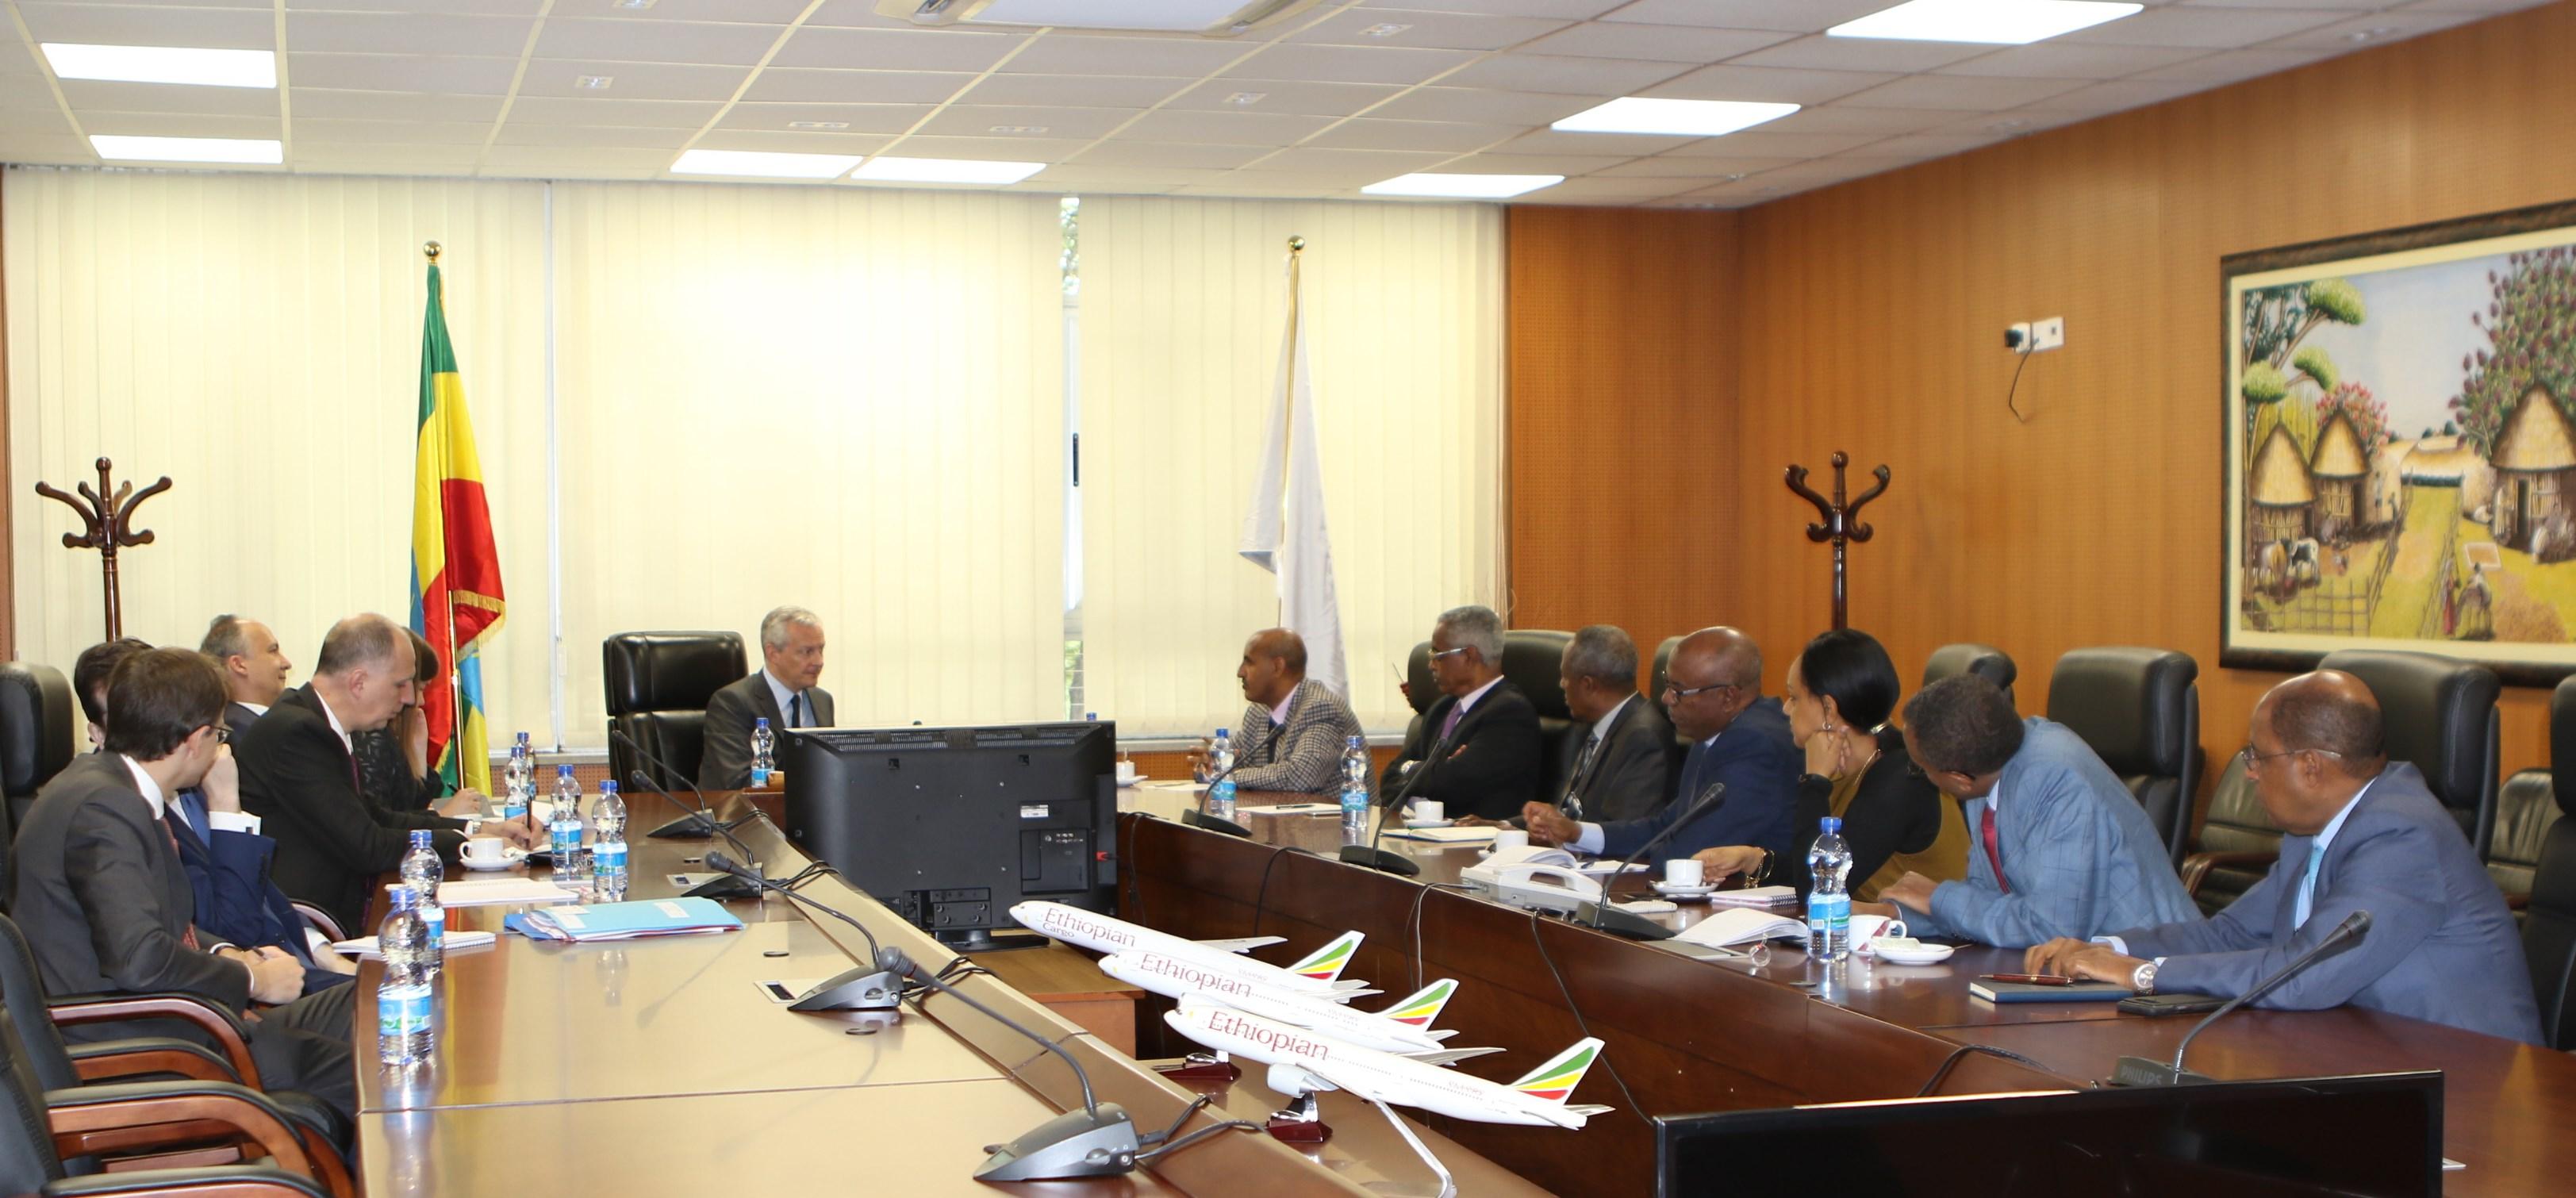 French Minister of Economy & Finance Visits Ethiopian Addis Ababa, 22 July 2019